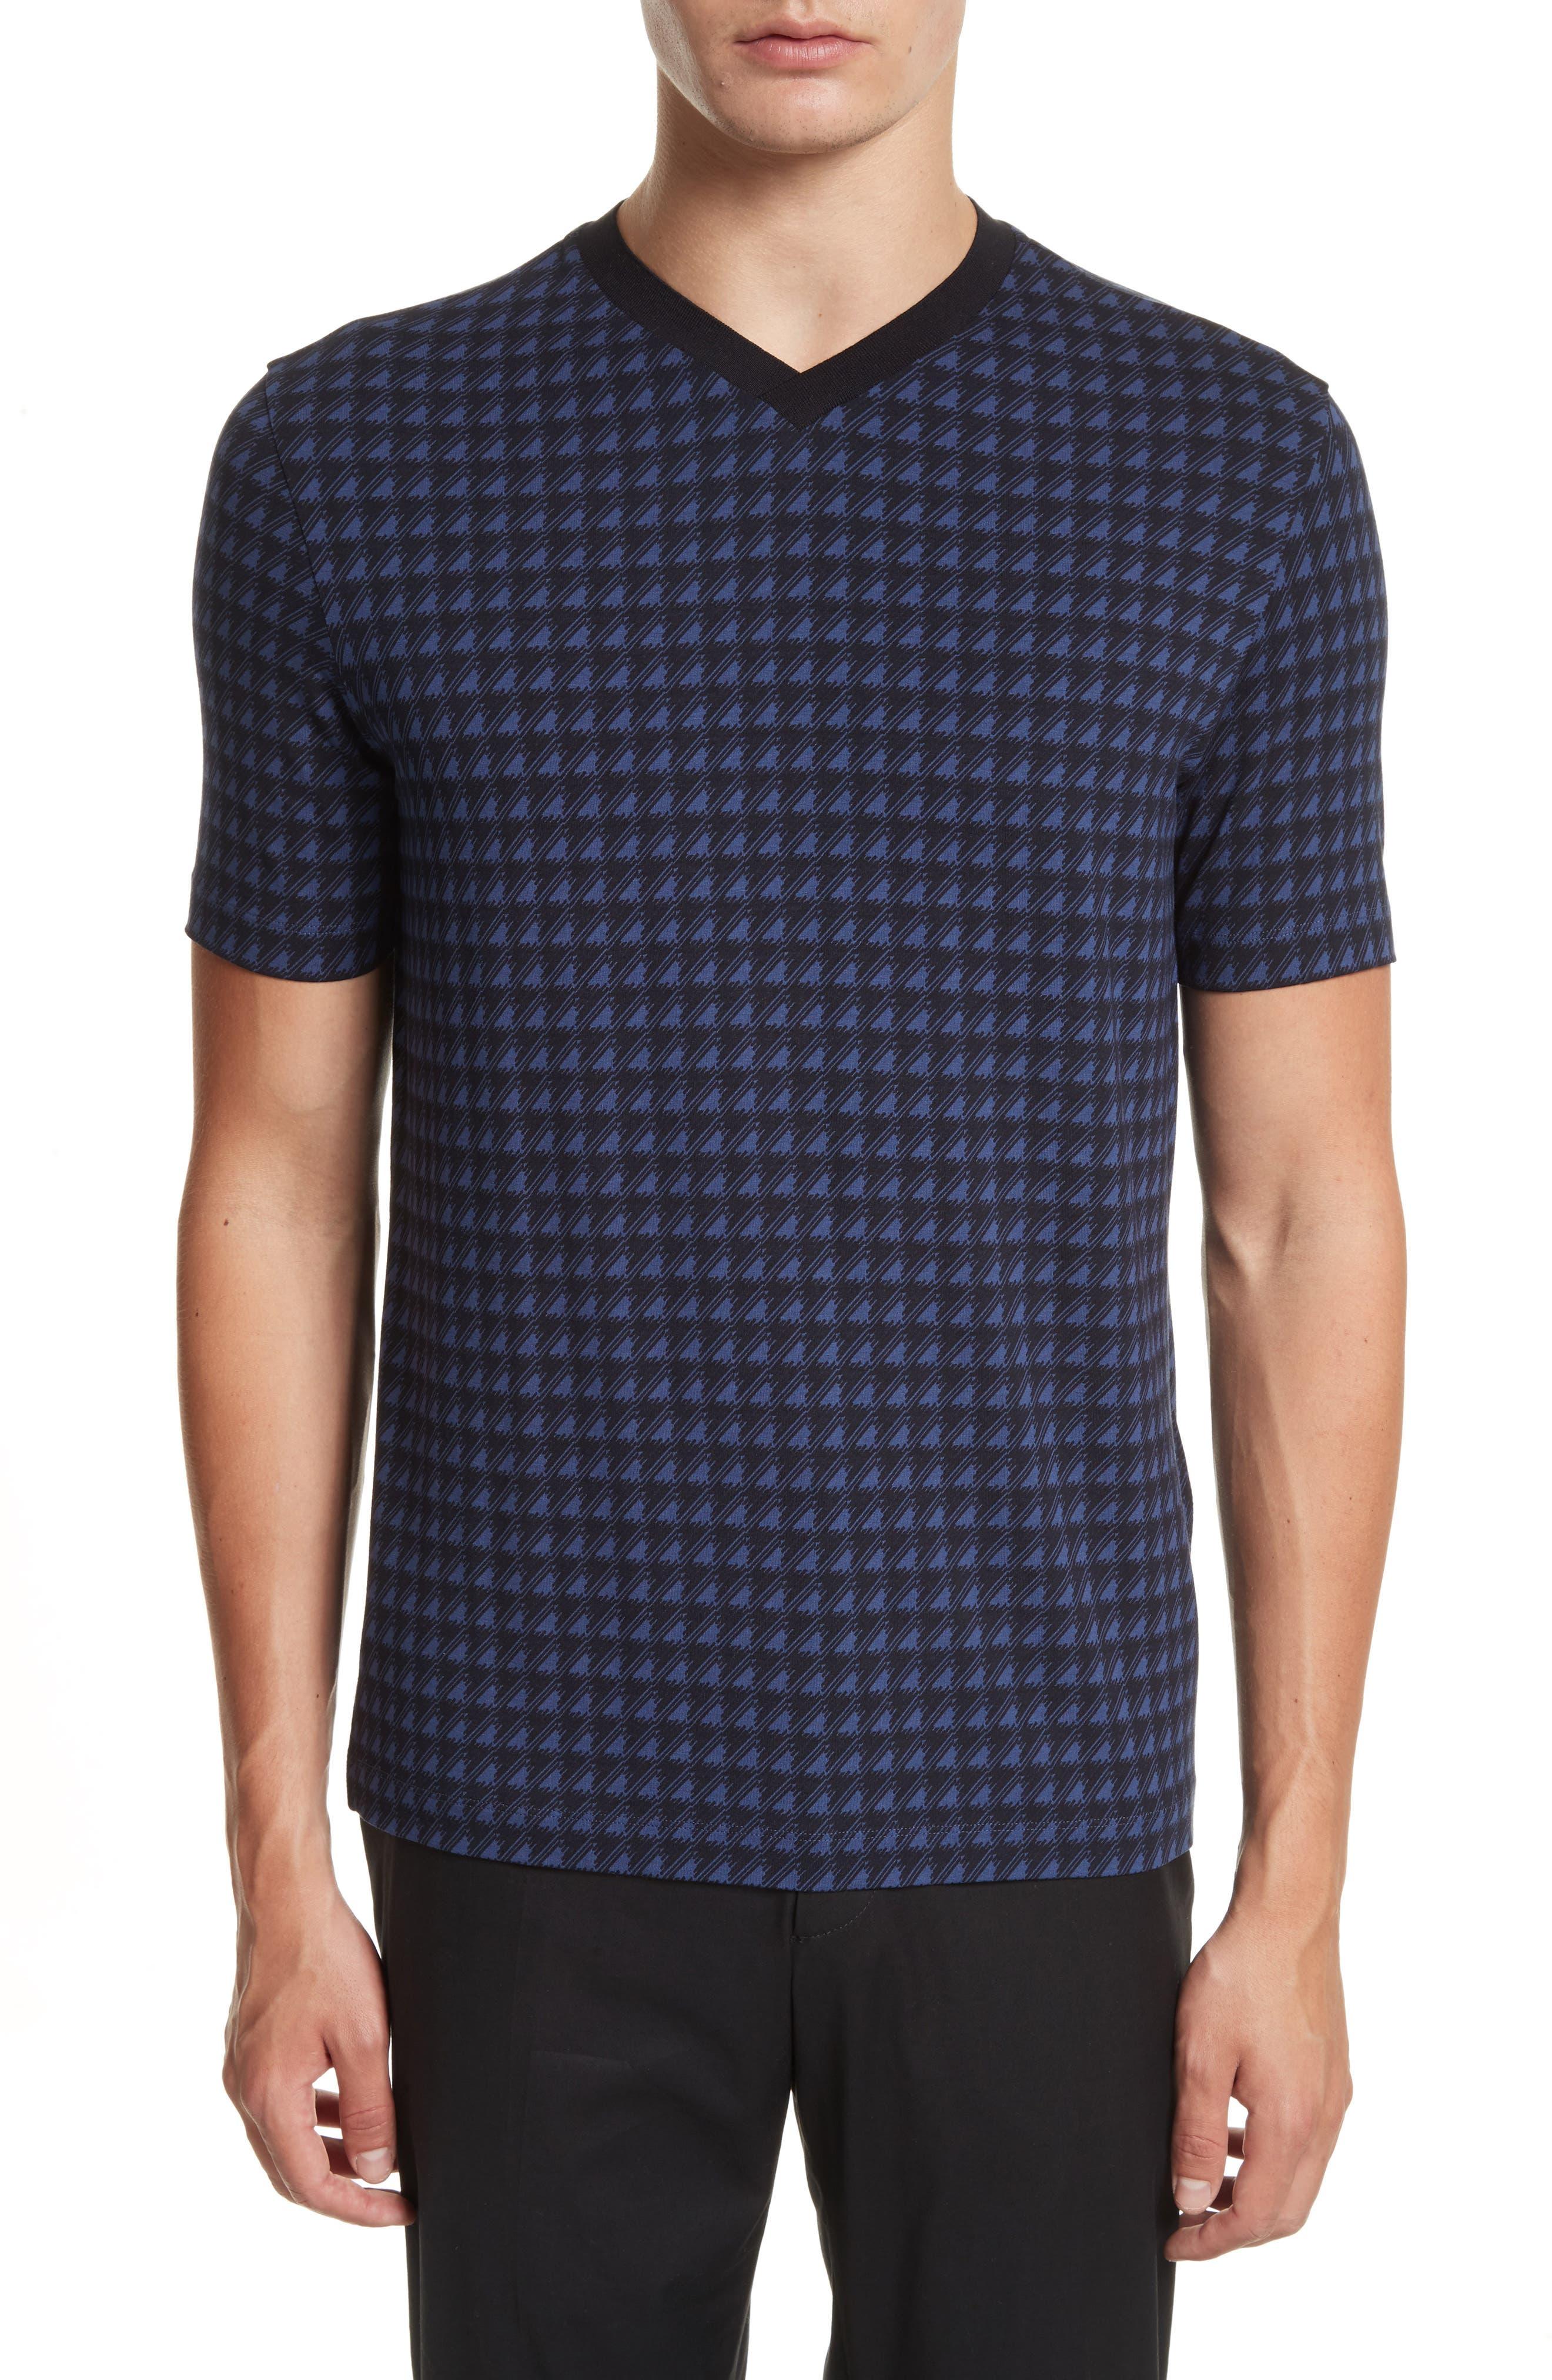 Alternate Image 1 Selected - Armani Collezioni High V-Neck T-Shirt